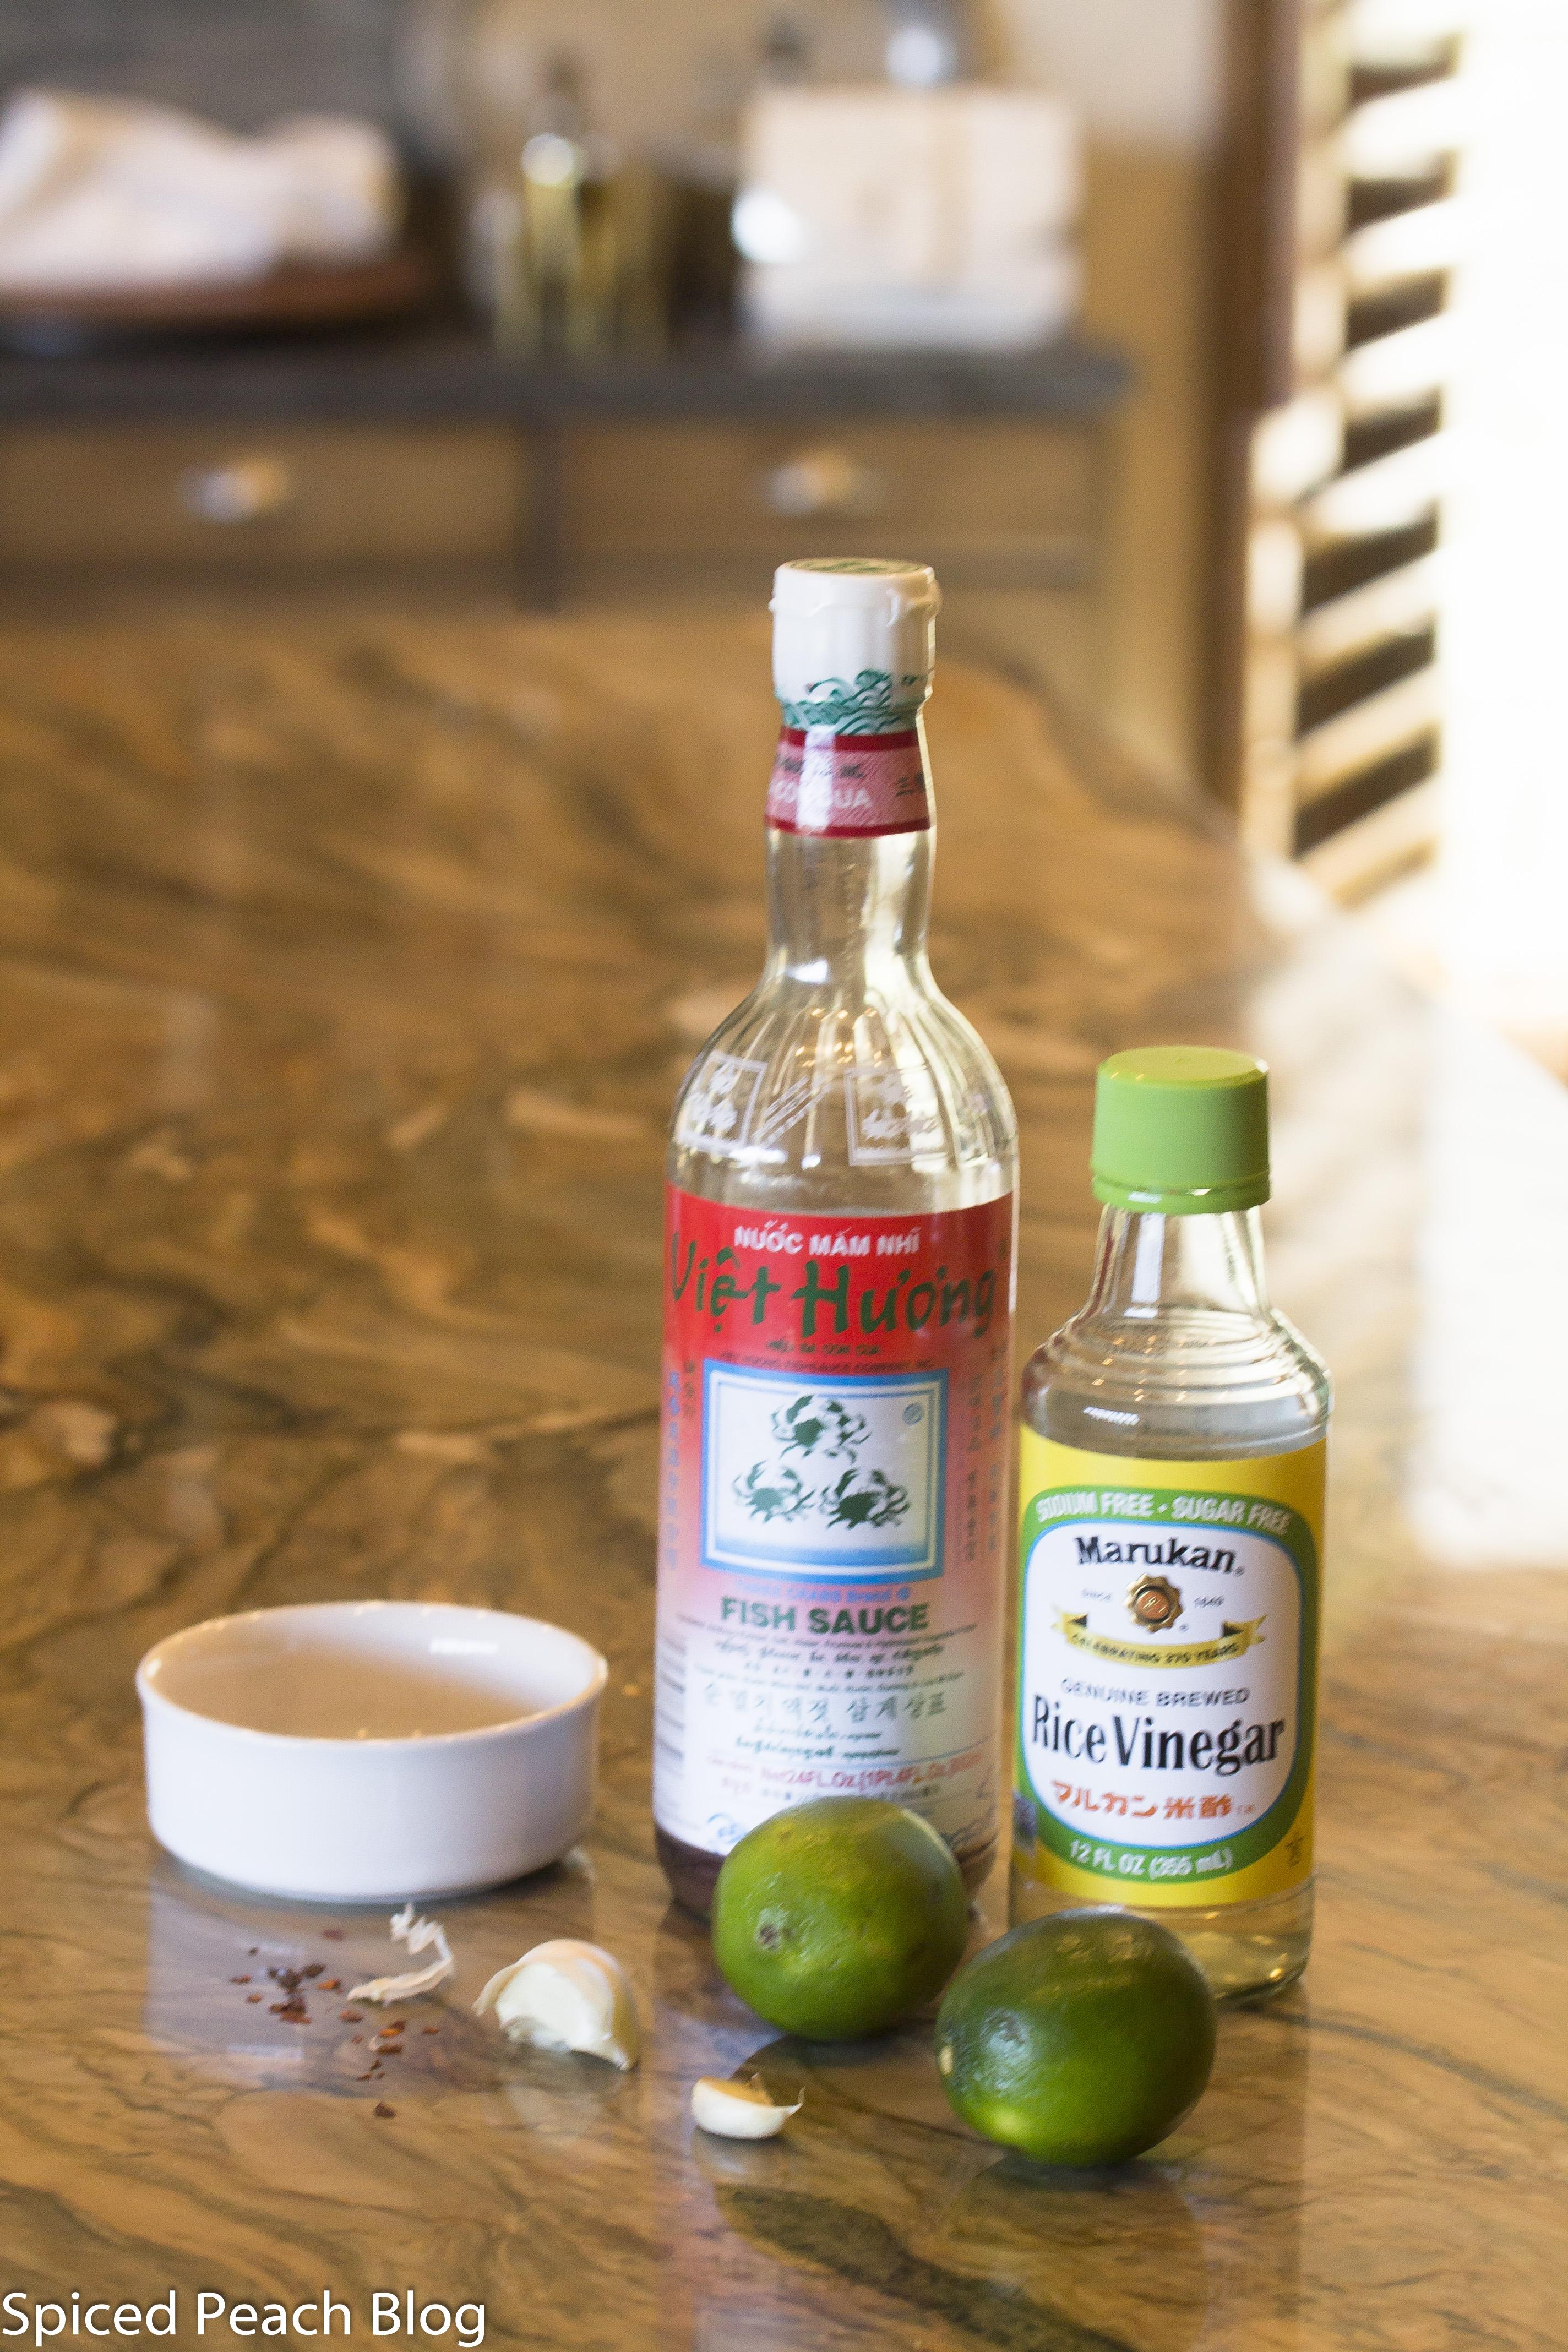 Fish Sauce and Rice Vinegar